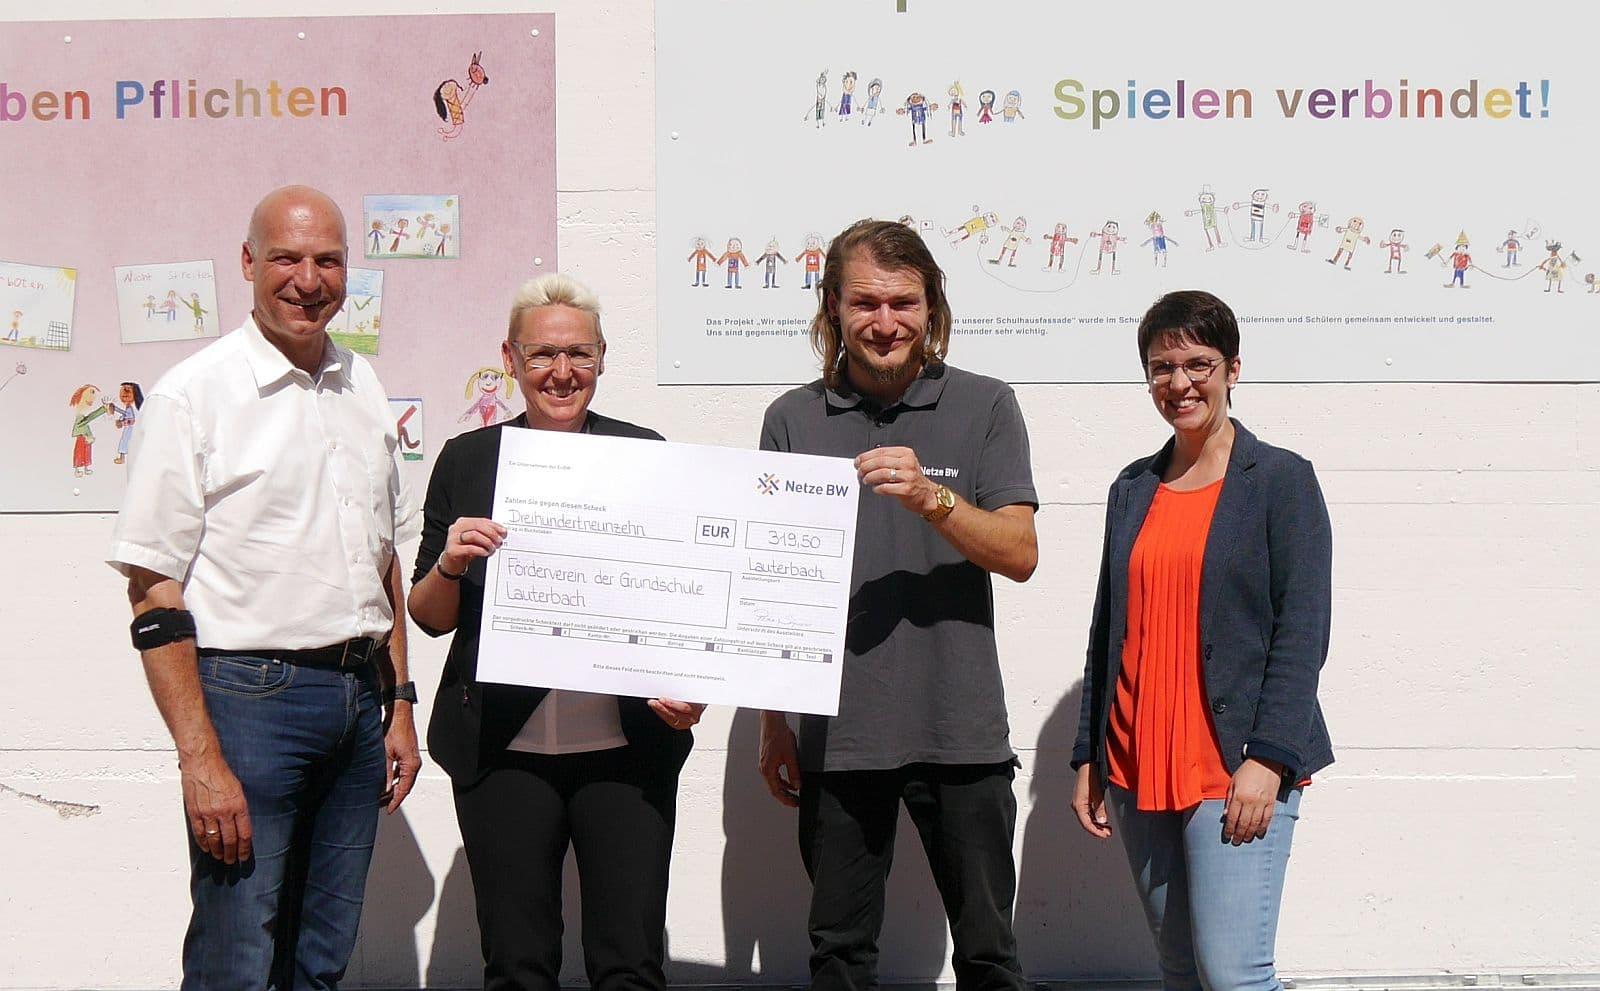 Bürgermeister Norbert Swoboda, Elke Maier, Stephan Kiesinger und Rektorin Sandra Winterhalter (von links). Foto: pm